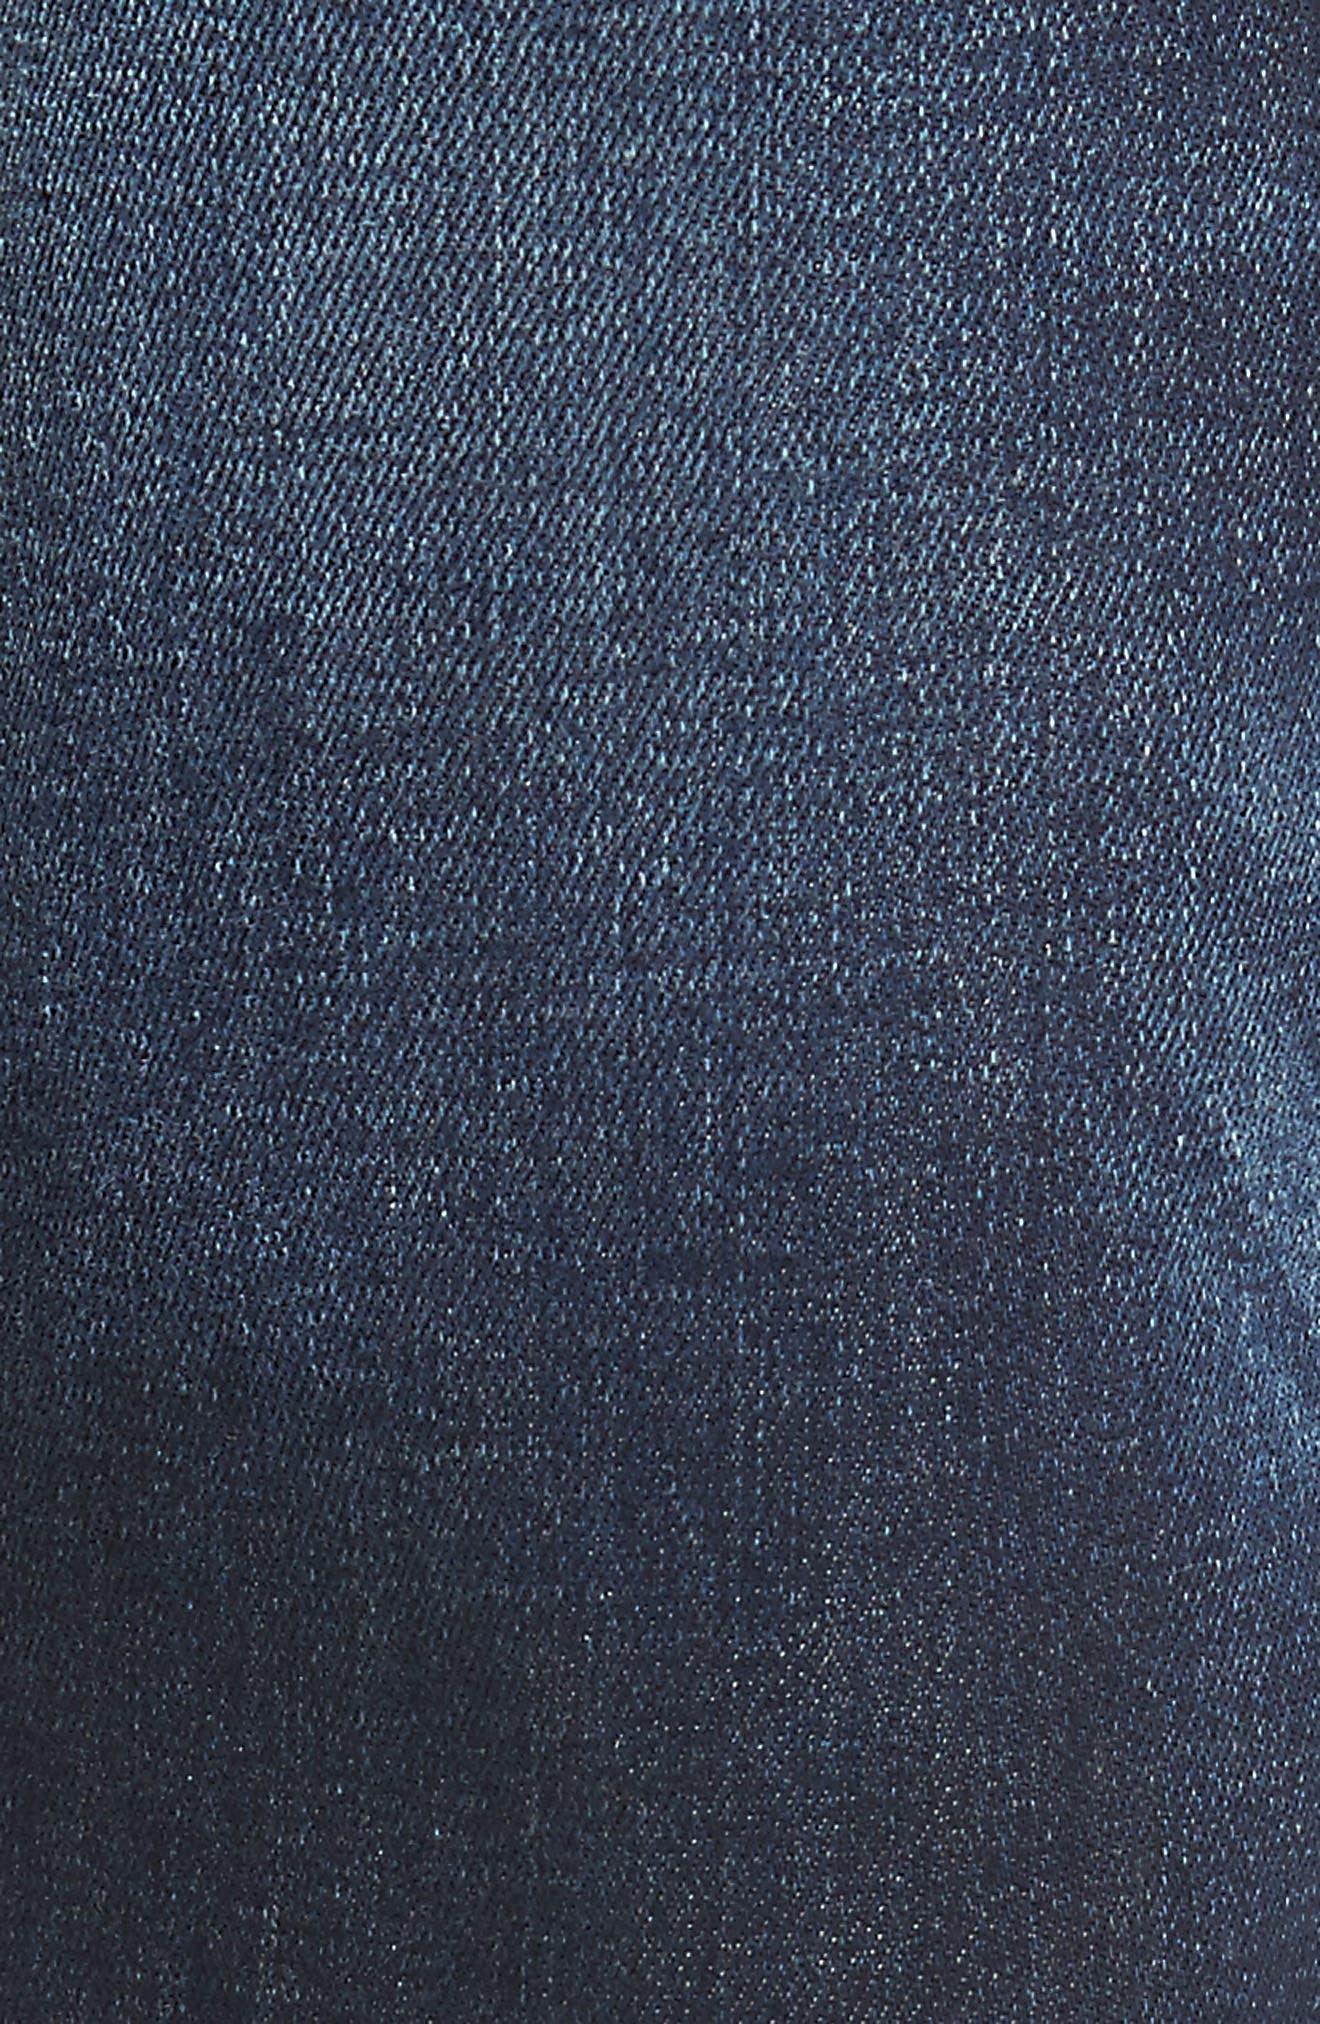 Fourk Skinny Fit Jeans,                             Alternate thumbnail 4, color,                             Denim